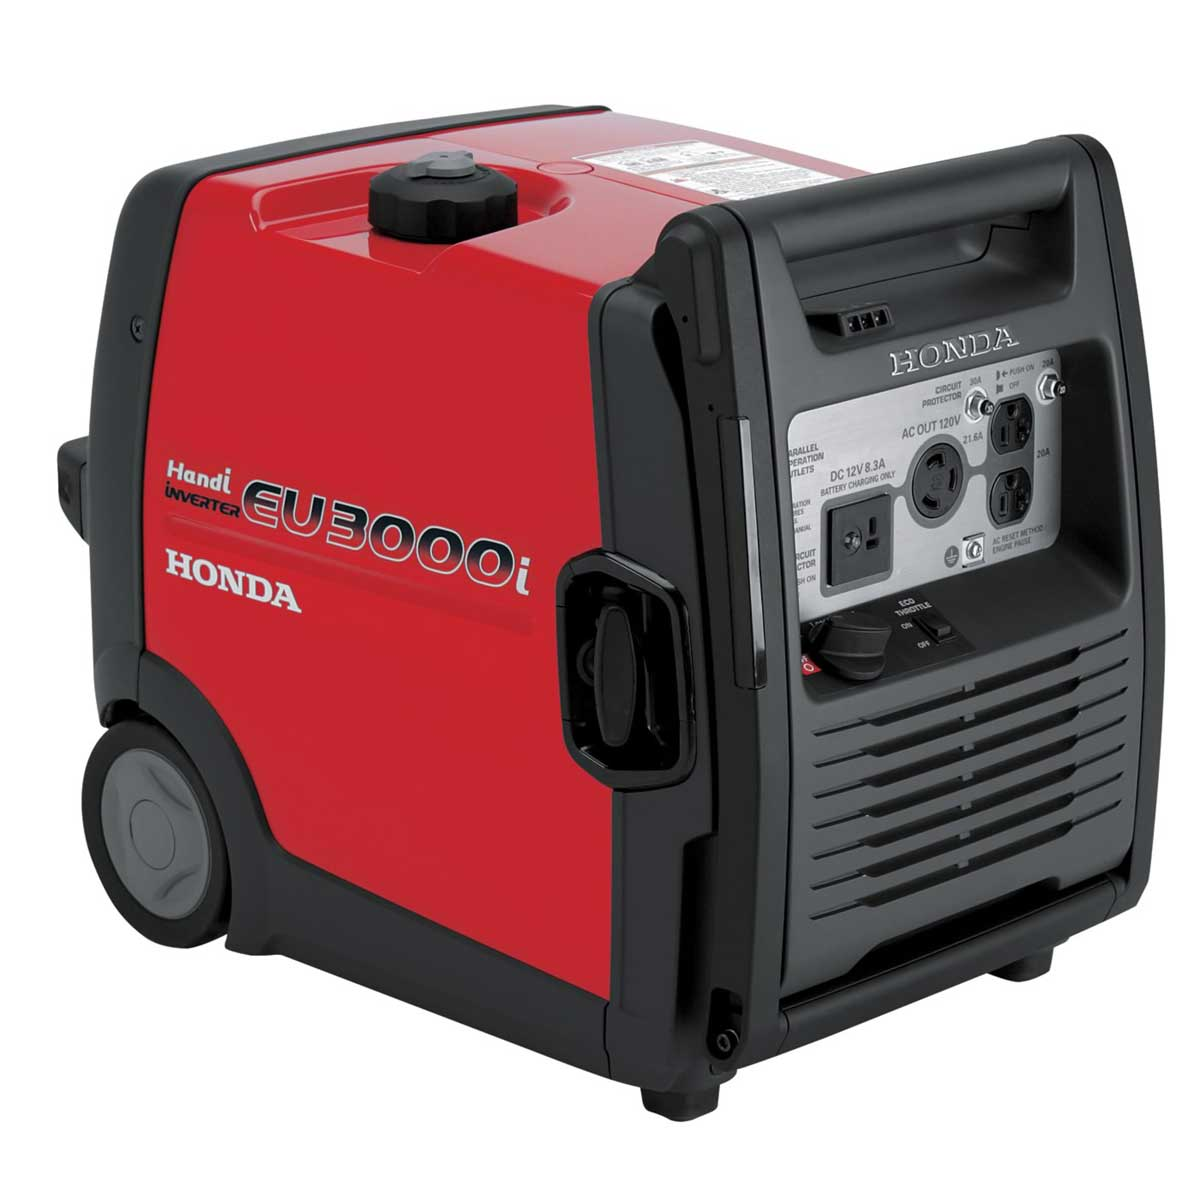 Honda Generator EU3000i Handi